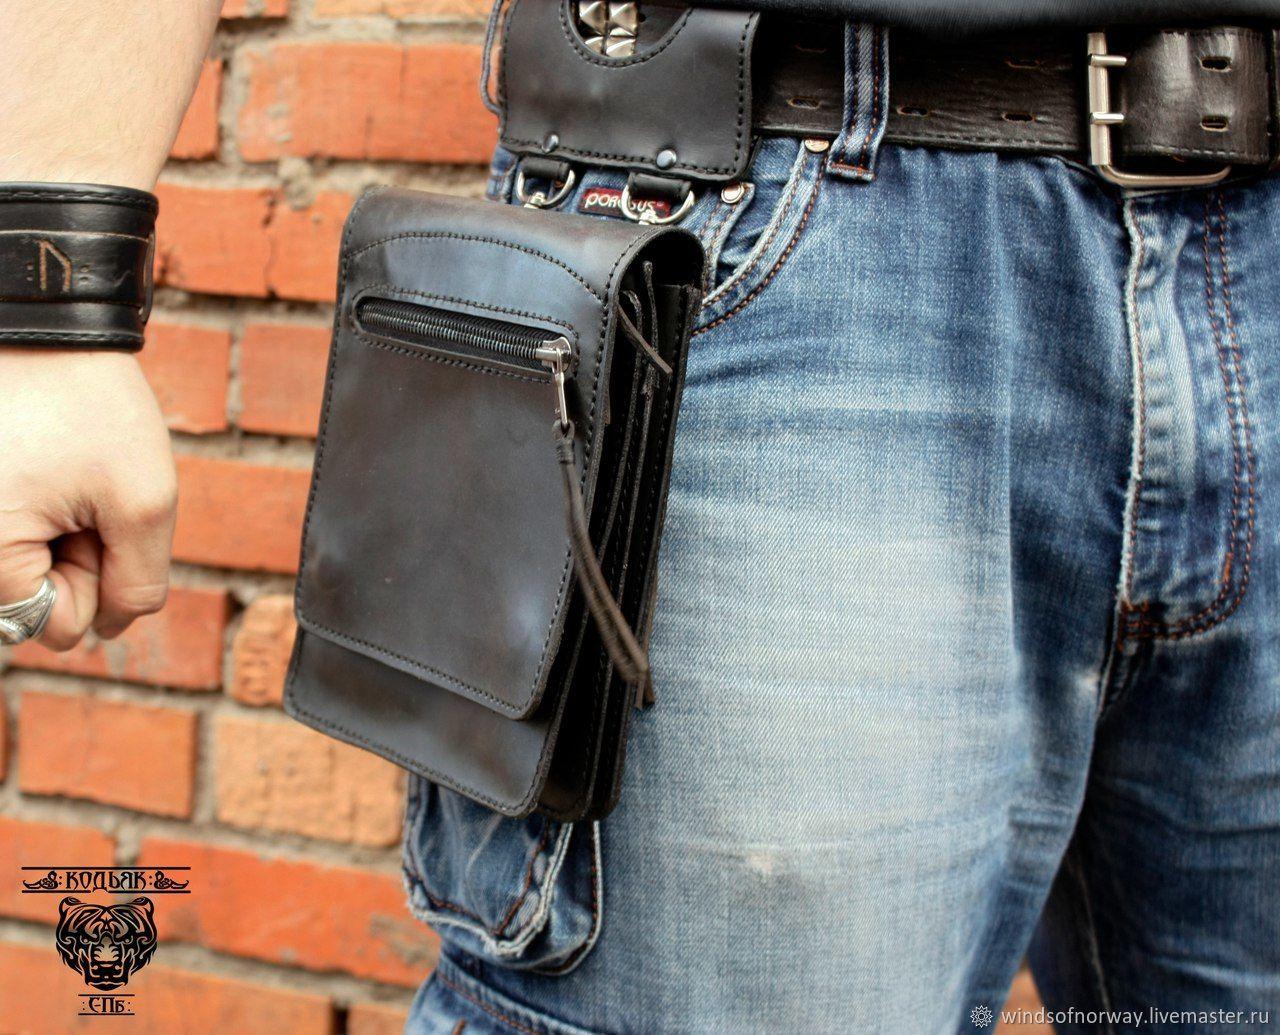 Поясная сумка полоская на заказ, Поясная сумка, Санкт-Петербург,  Фото №1